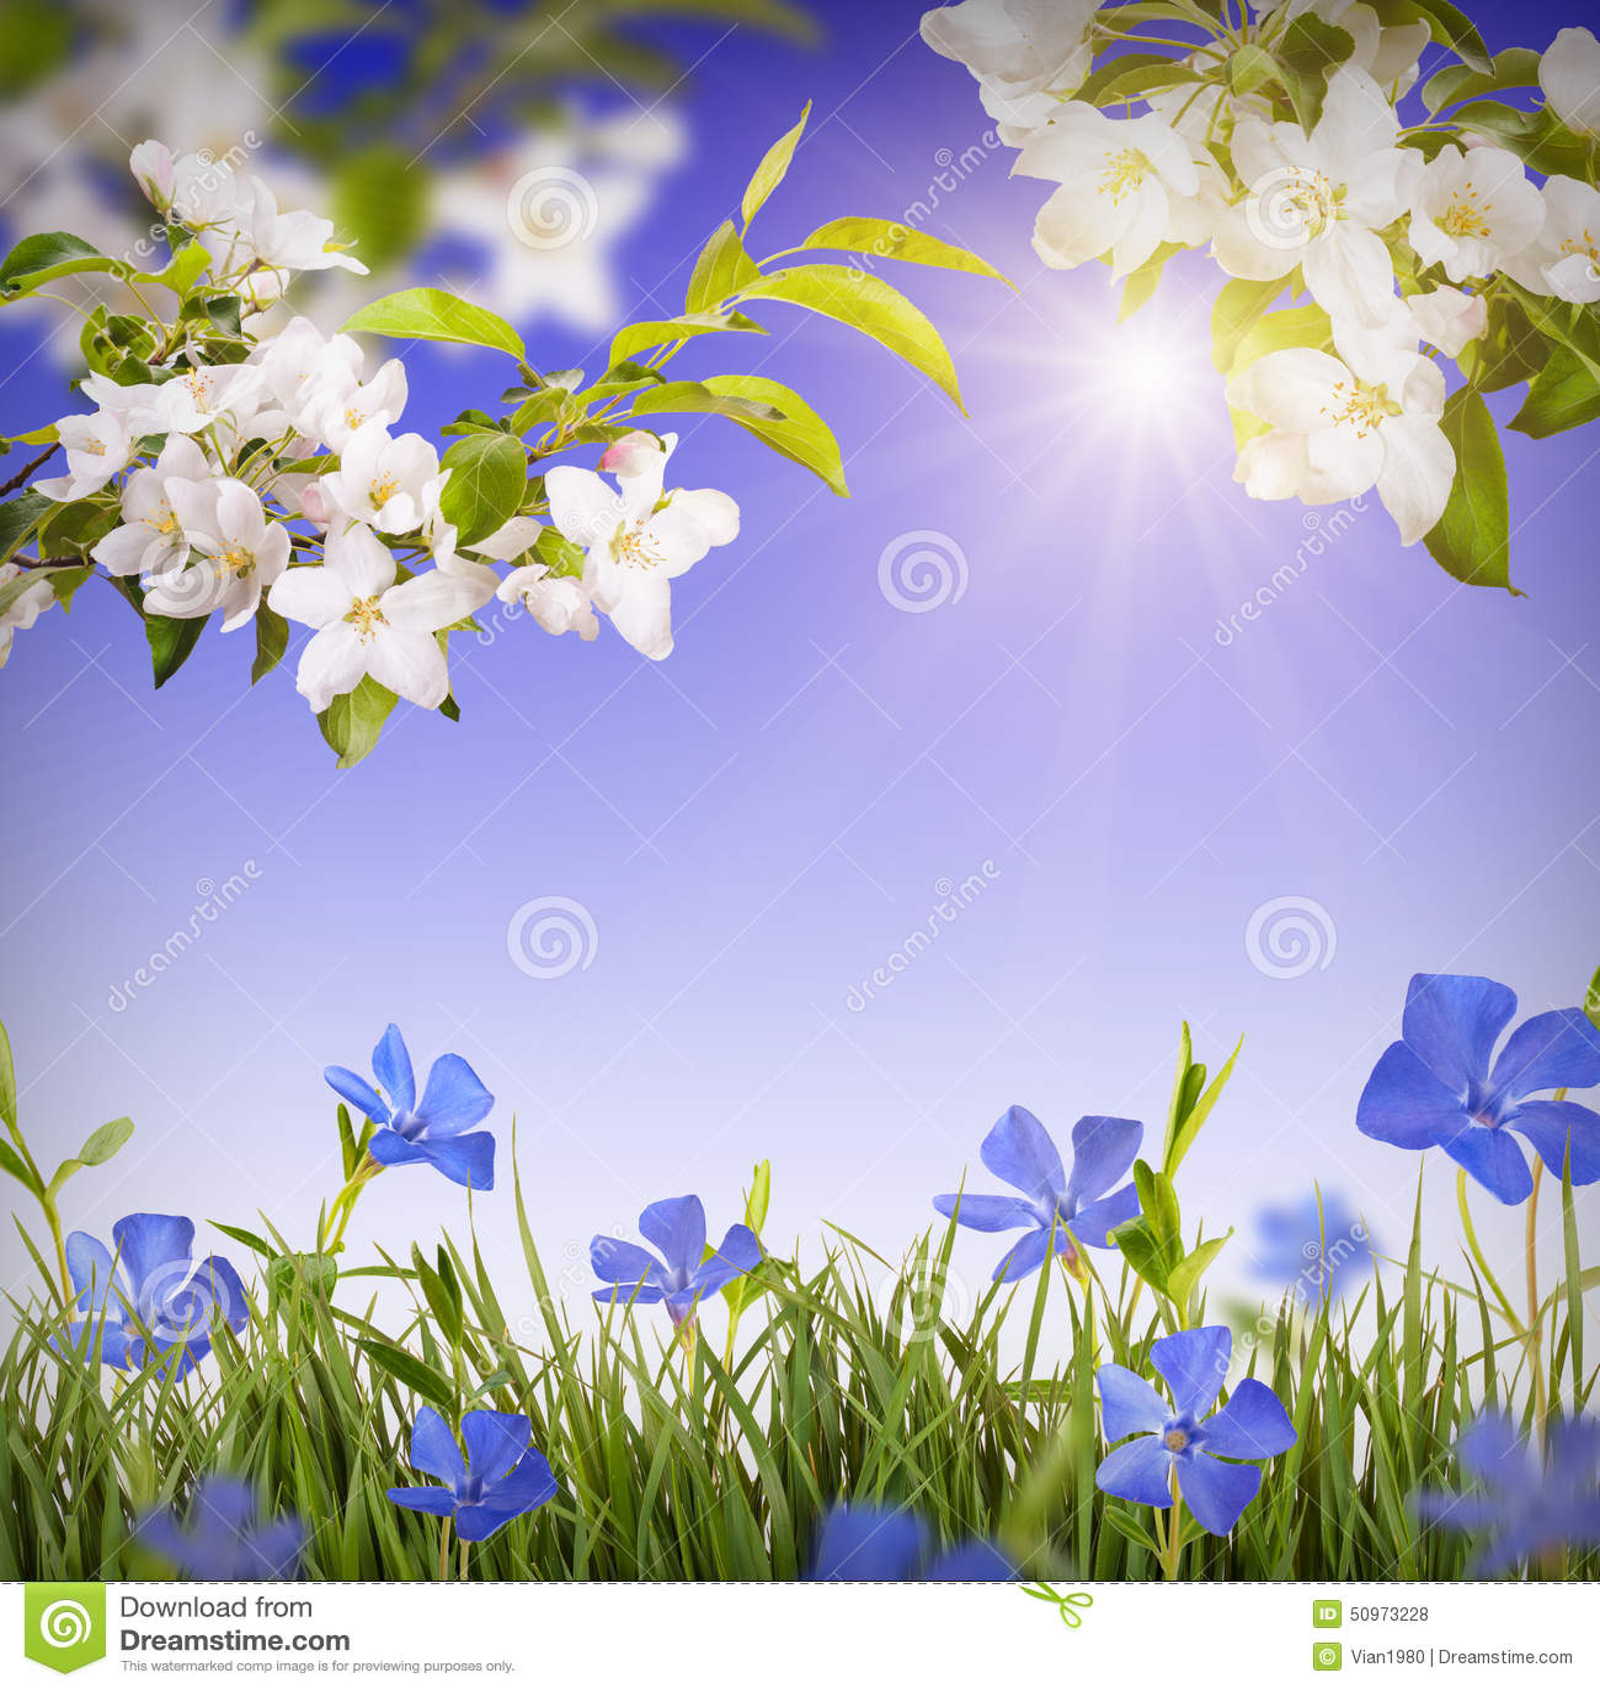 Flower Background Stock Photo. Image Of Bokeh, Fresh